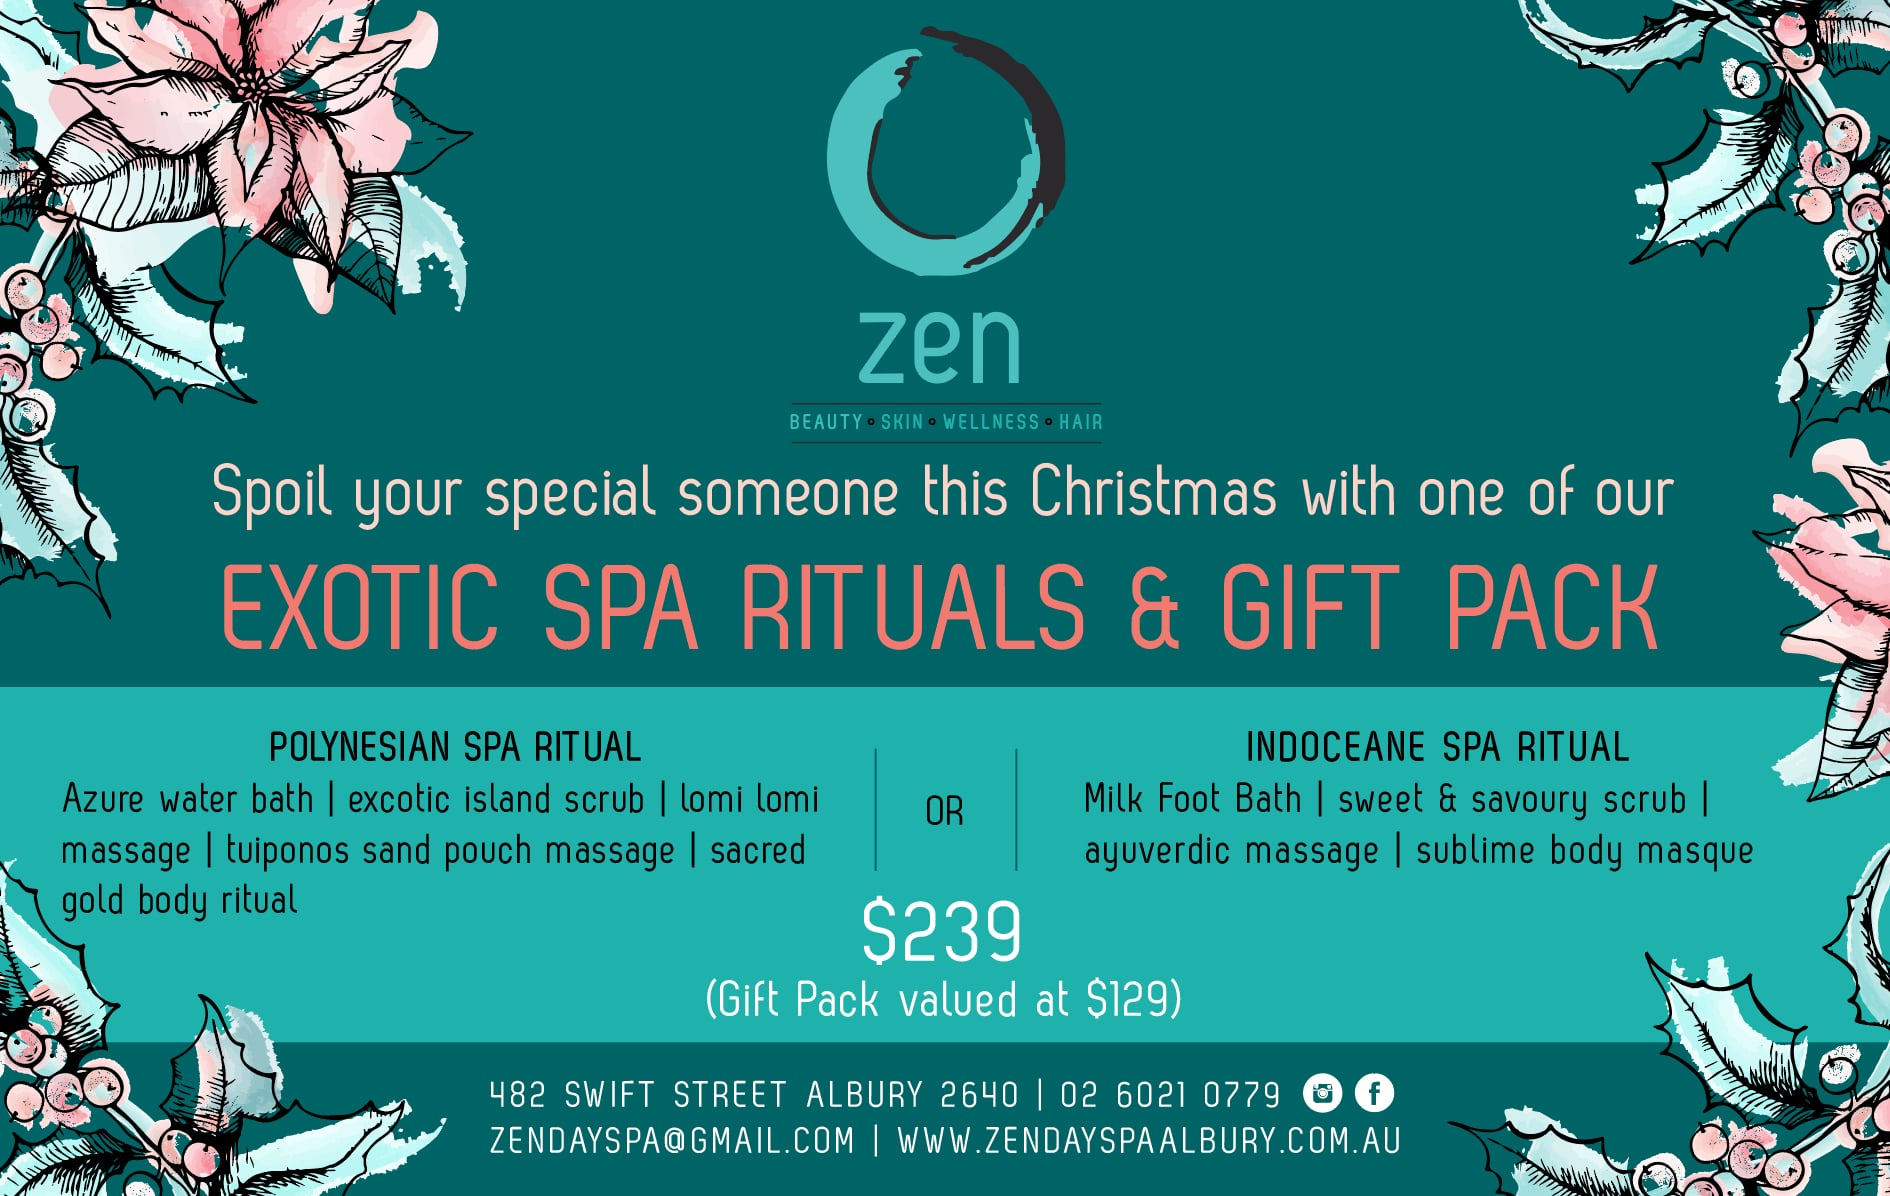 Zen Day Spa - Christmas Gift pack 2017